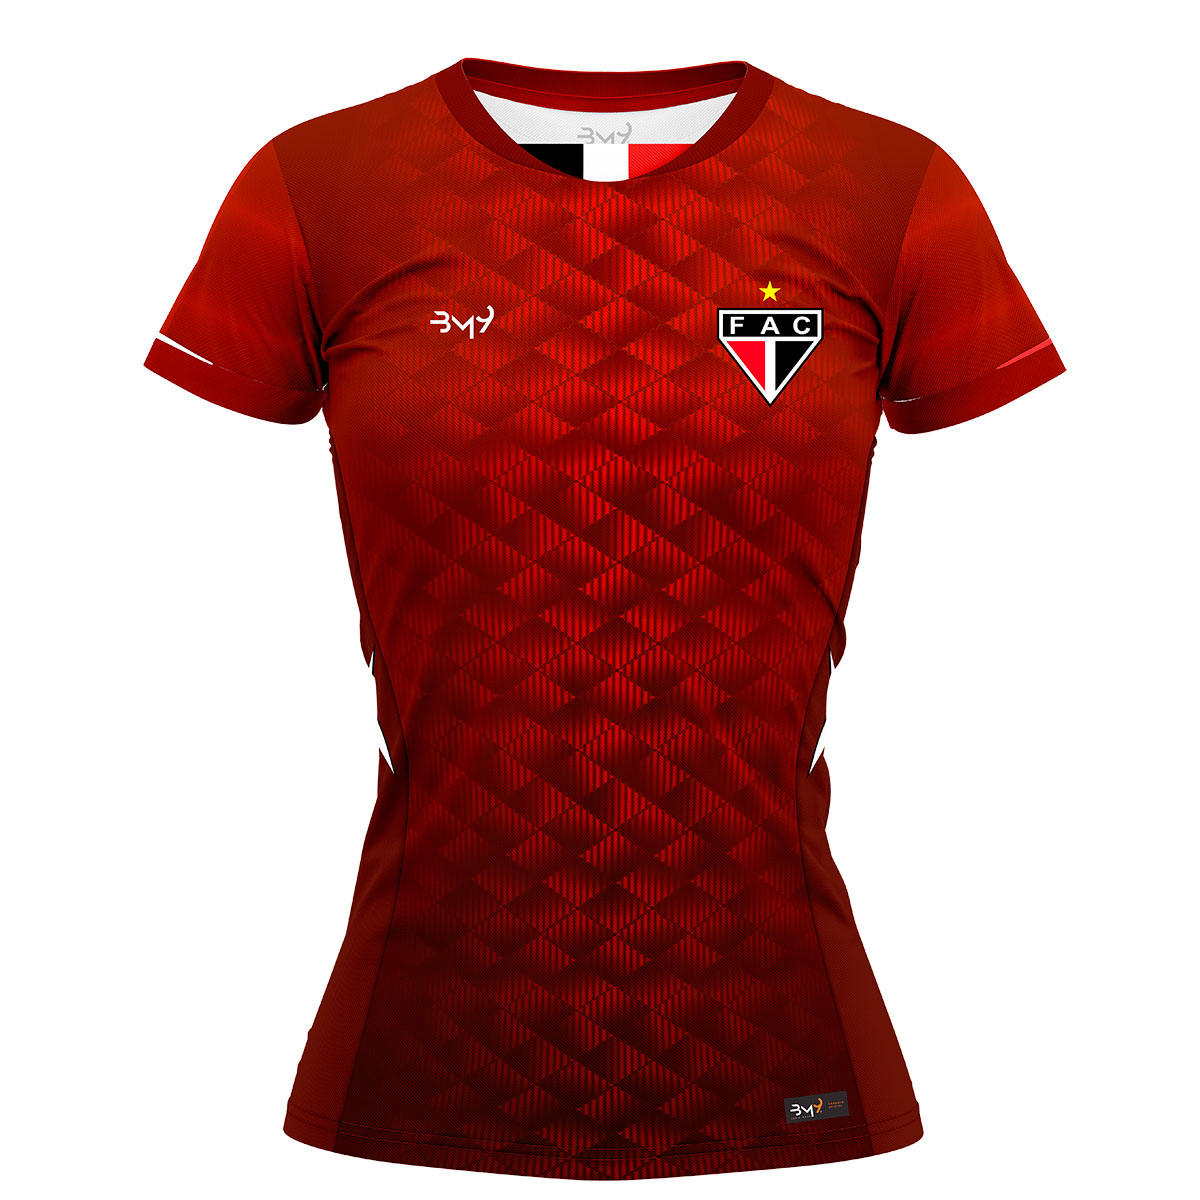 Camisa Uniforme 03 FEMININA sem patrocínio N.10 REF.4821008 (2021) (PRÉ-VENDA)